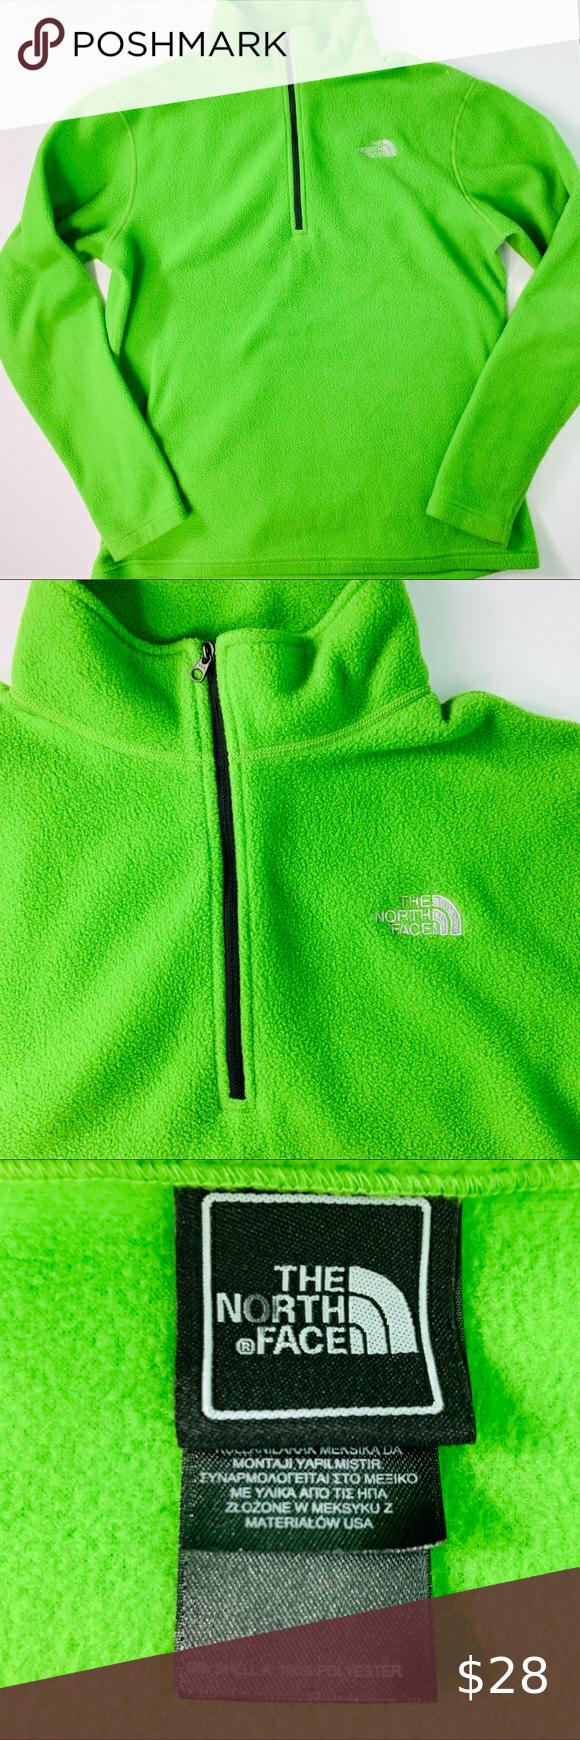 The North Face Lime Green Fleece Half Zip Pullover Half Zip Pullover The North Face Half Zip [ 1740 x 580 Pixel ]